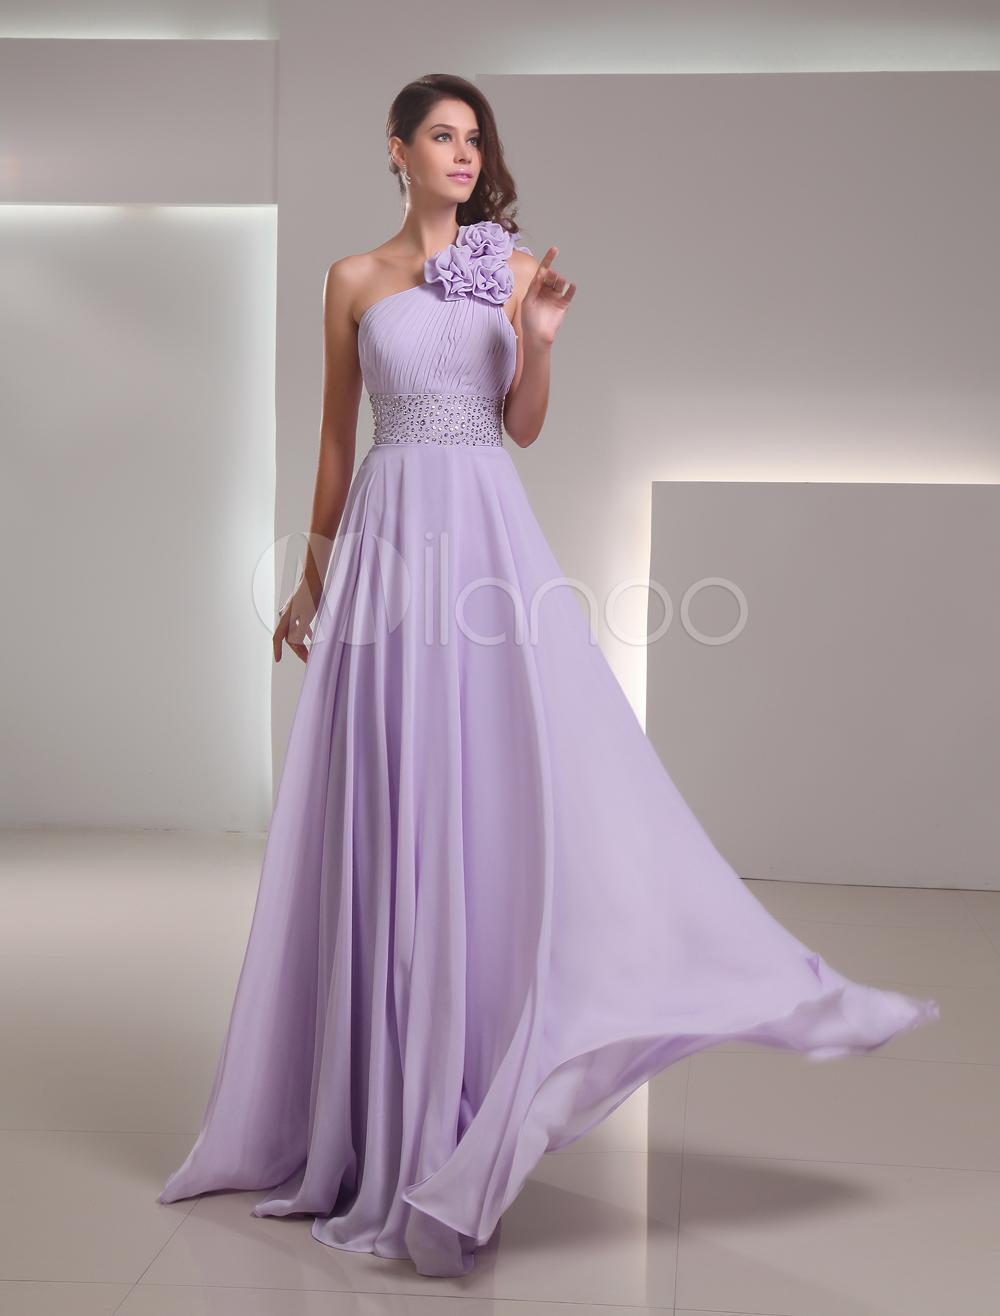 853d47df5 Encantador vestido Lila gasa Floral de un solo hombro piso-longitud Prom -  Dressinwedding.com